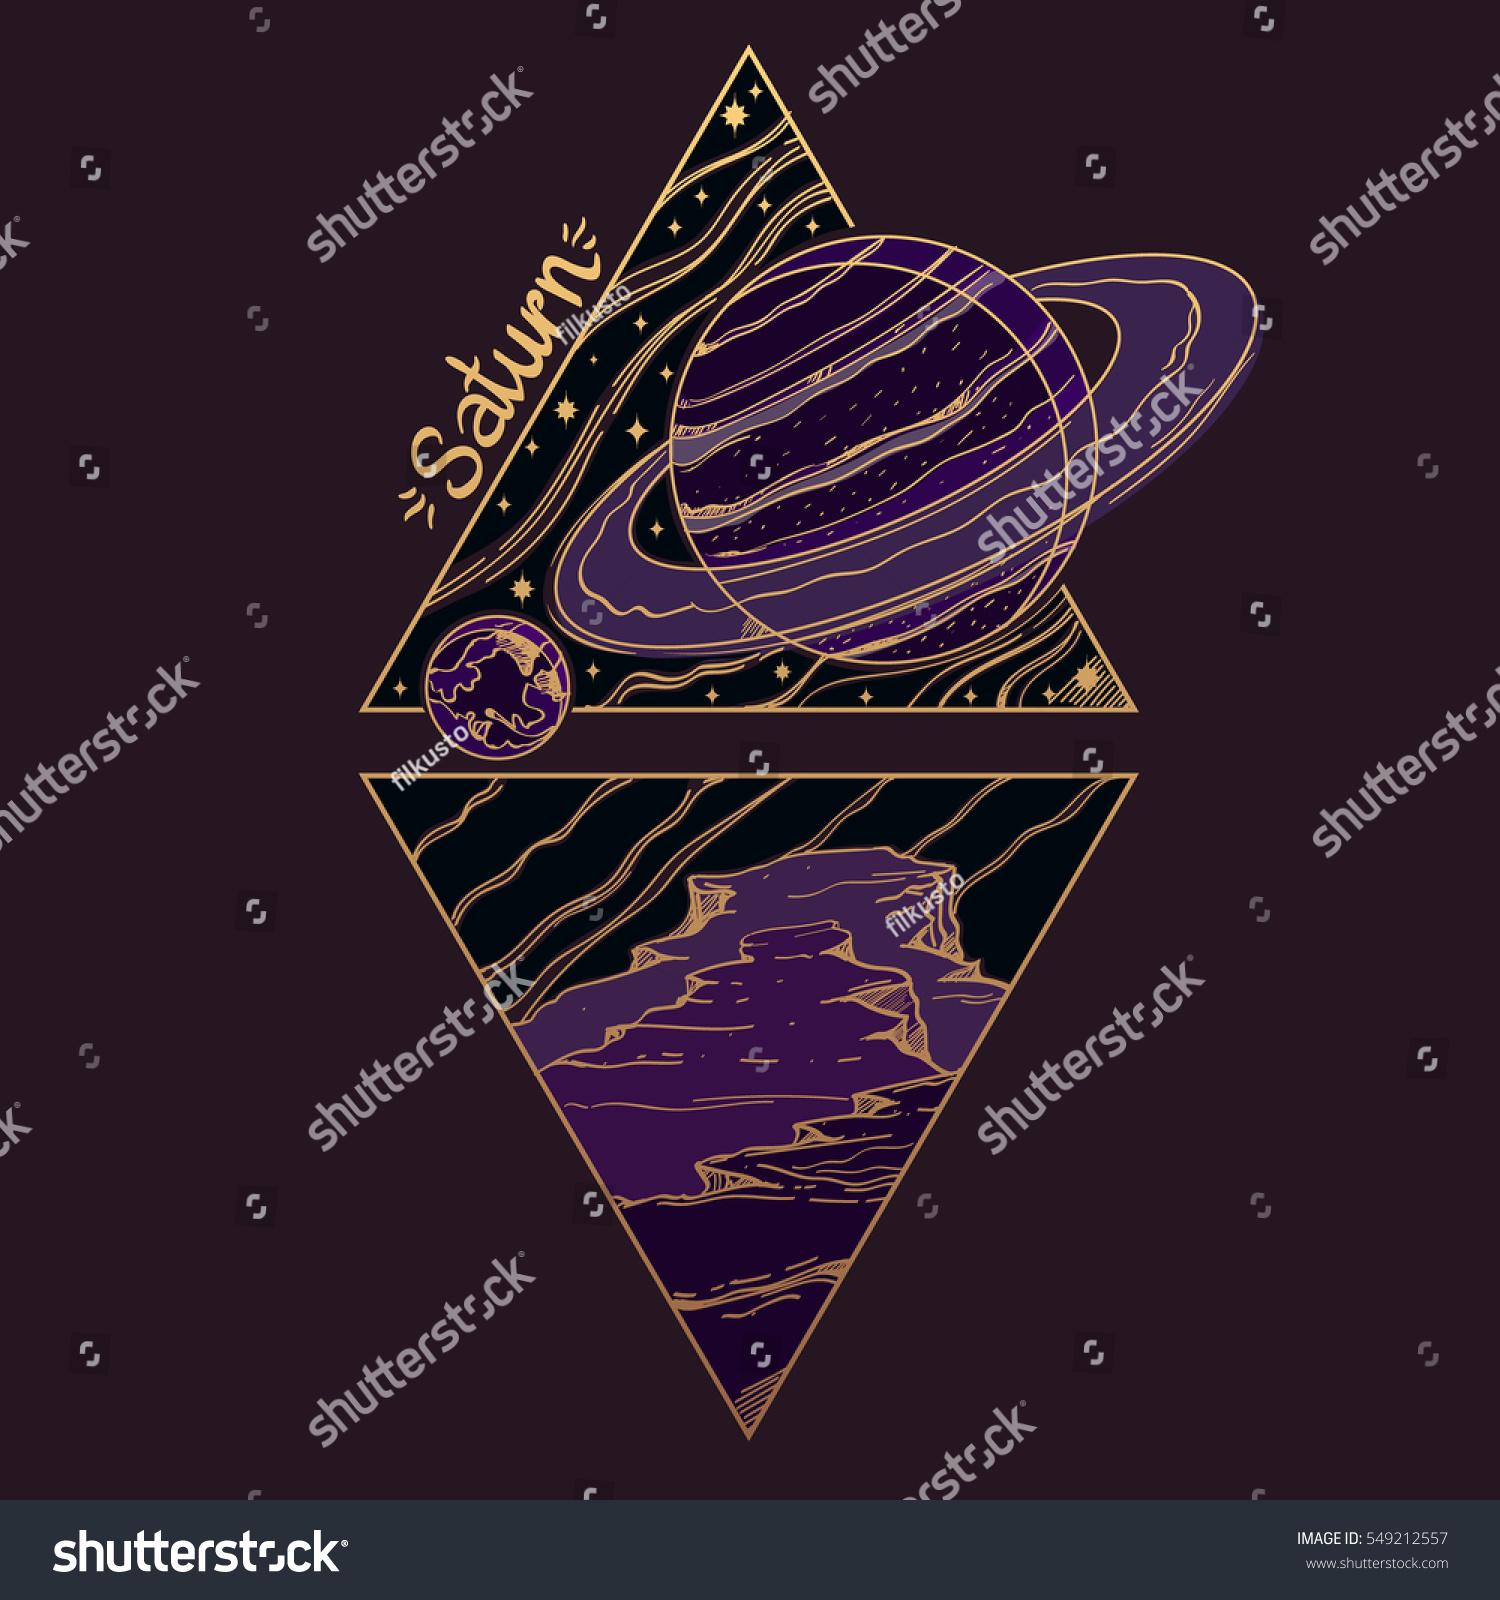 Saturn planets stars solar system symbols stock vector 549212557 planets and stars of solar system symbols for astronomy and astrology stylized buycottarizona